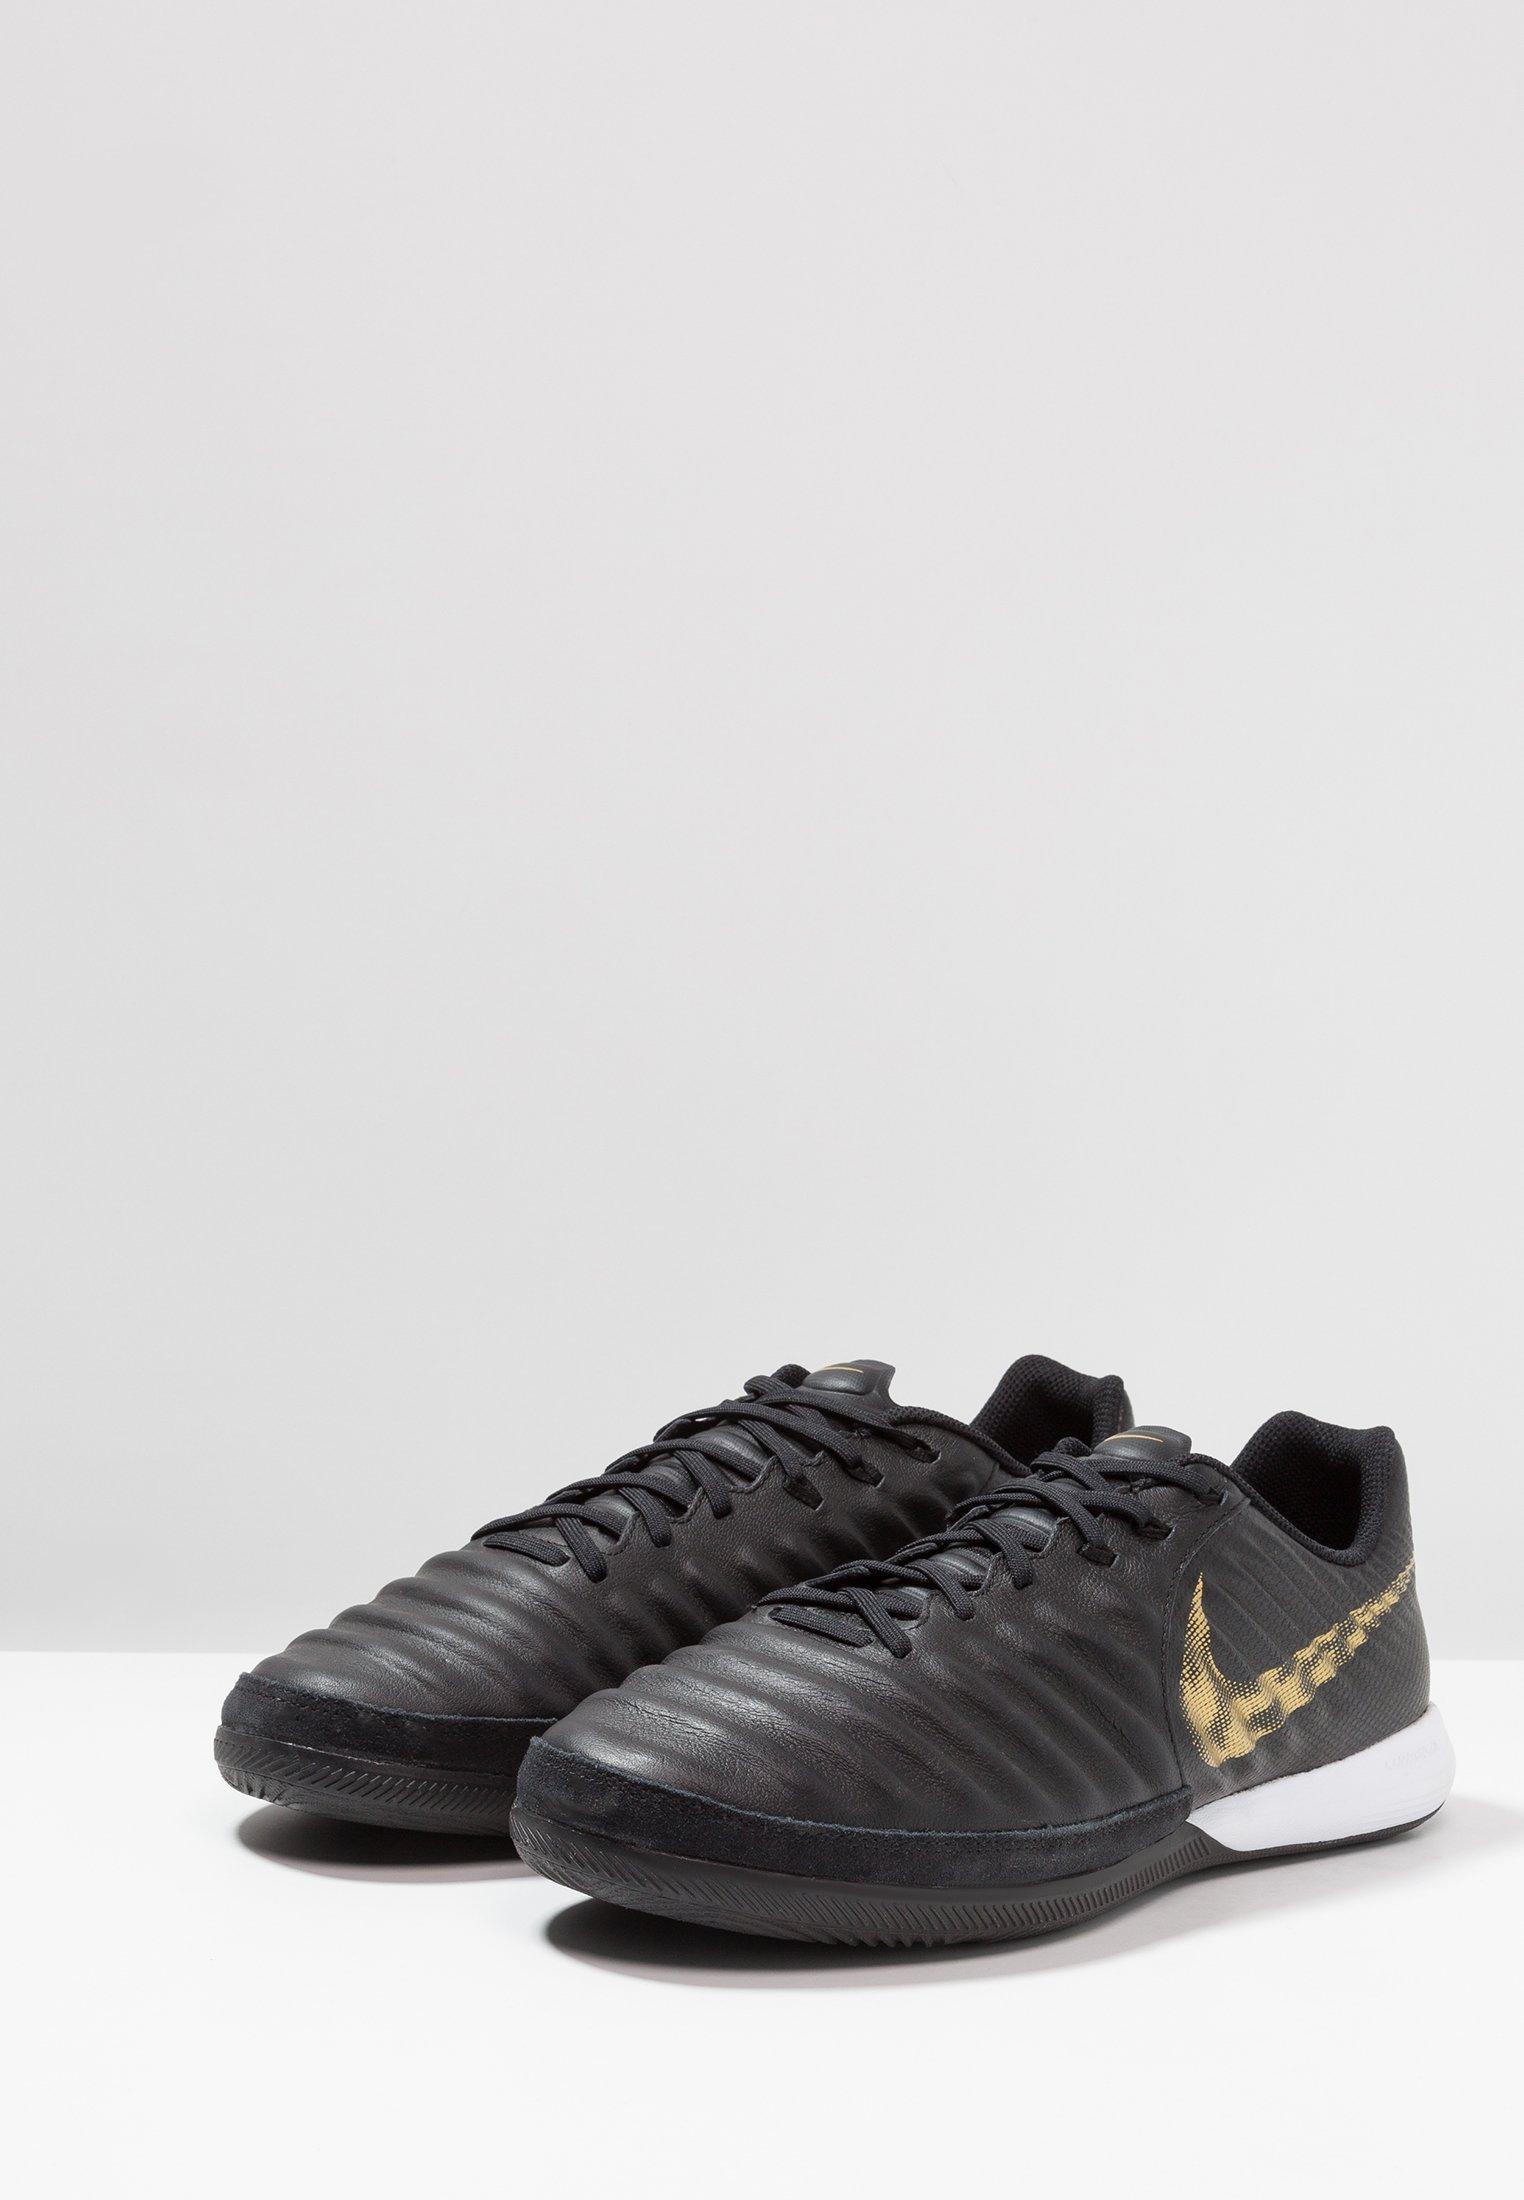 Nike metallic IcChaussures Performance Legendx Tiempo Pro Lunar Black Salle Vivid Foot En Gold De 7 CQdxthrBs